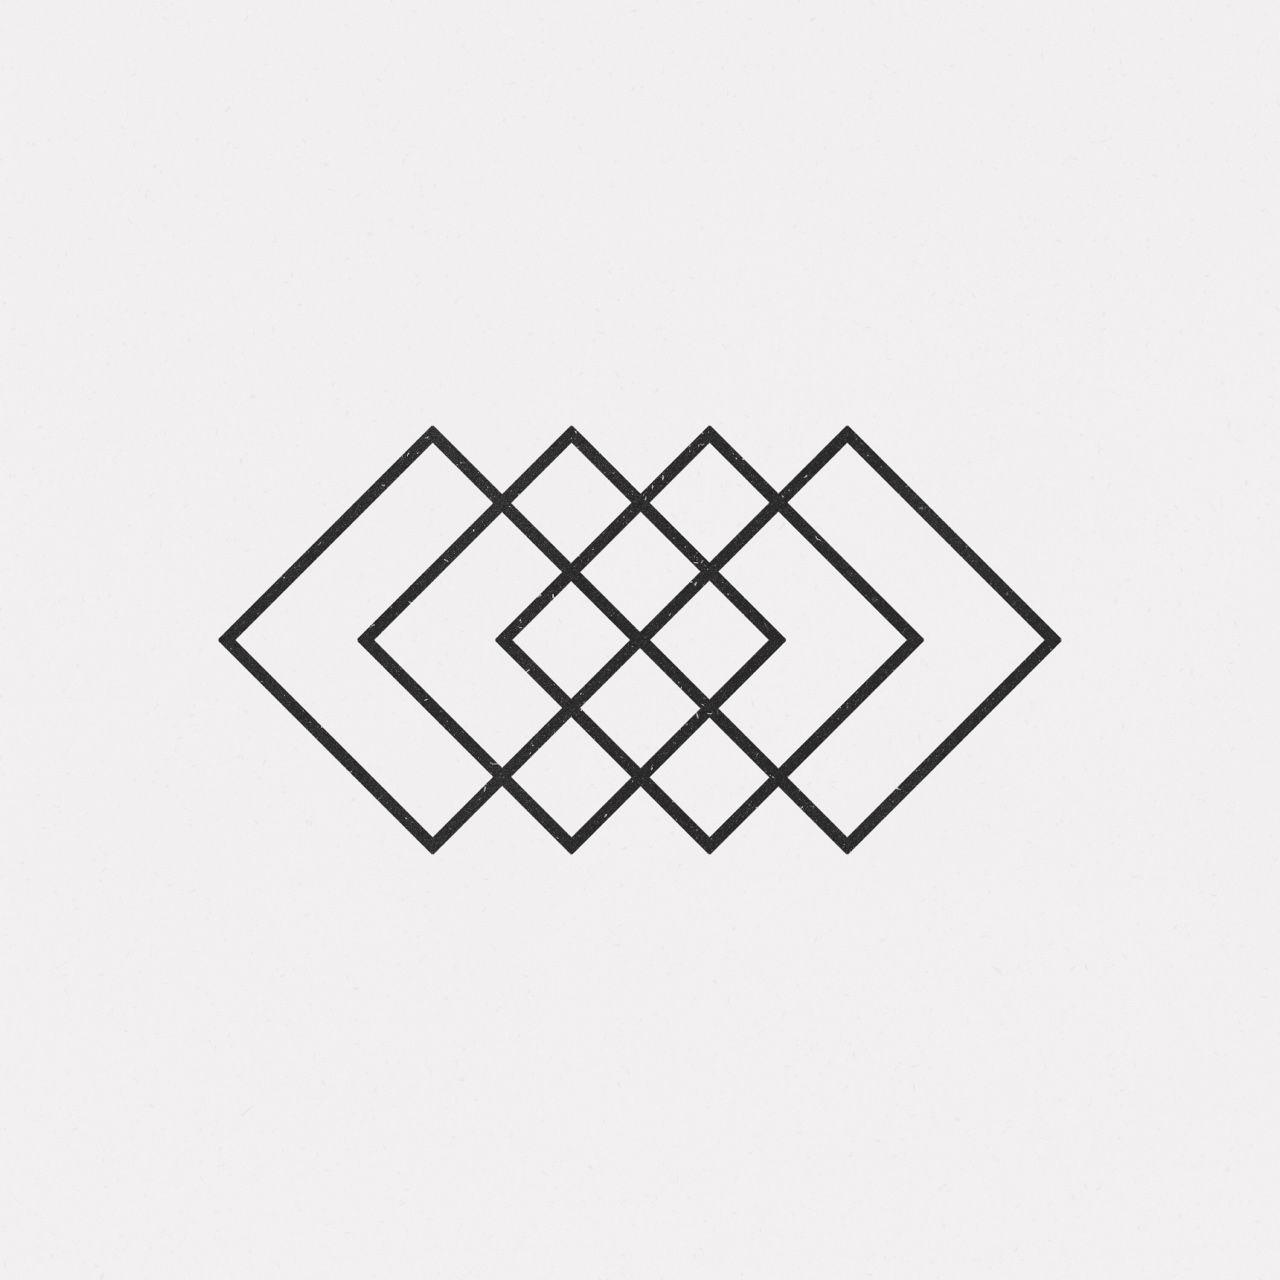 De15 426 A New Geometric Design Every Daybuy My Designs